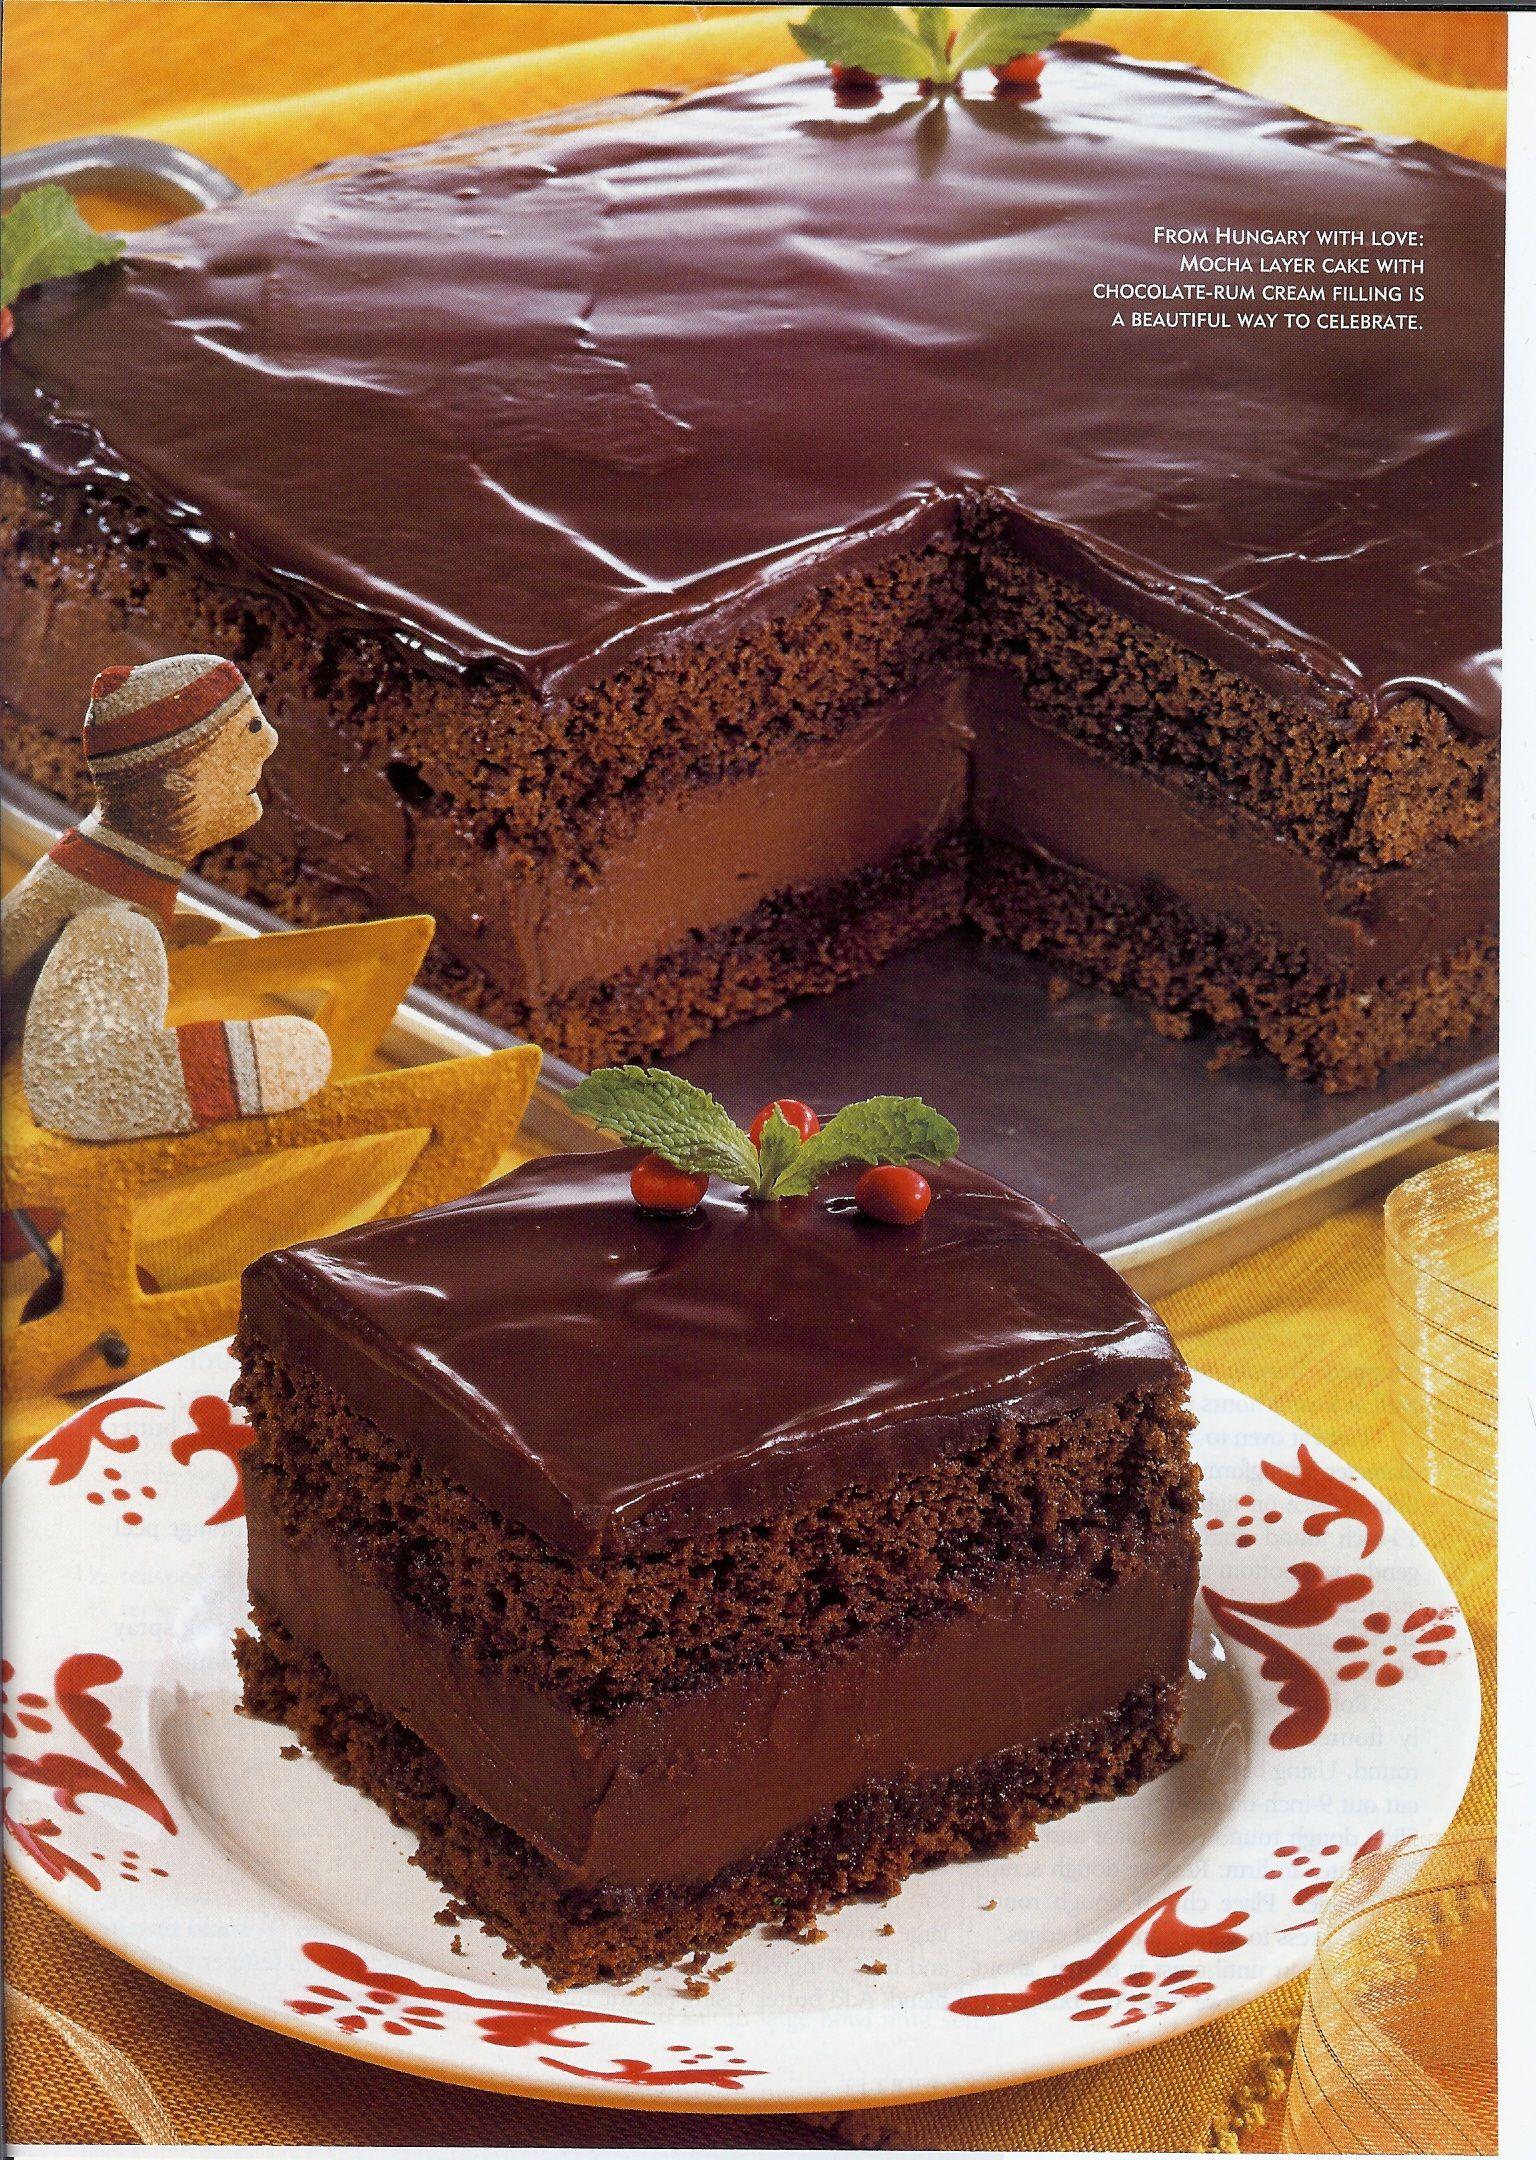 rigo jancsi the hungarian rhapsody of chocolate cakes